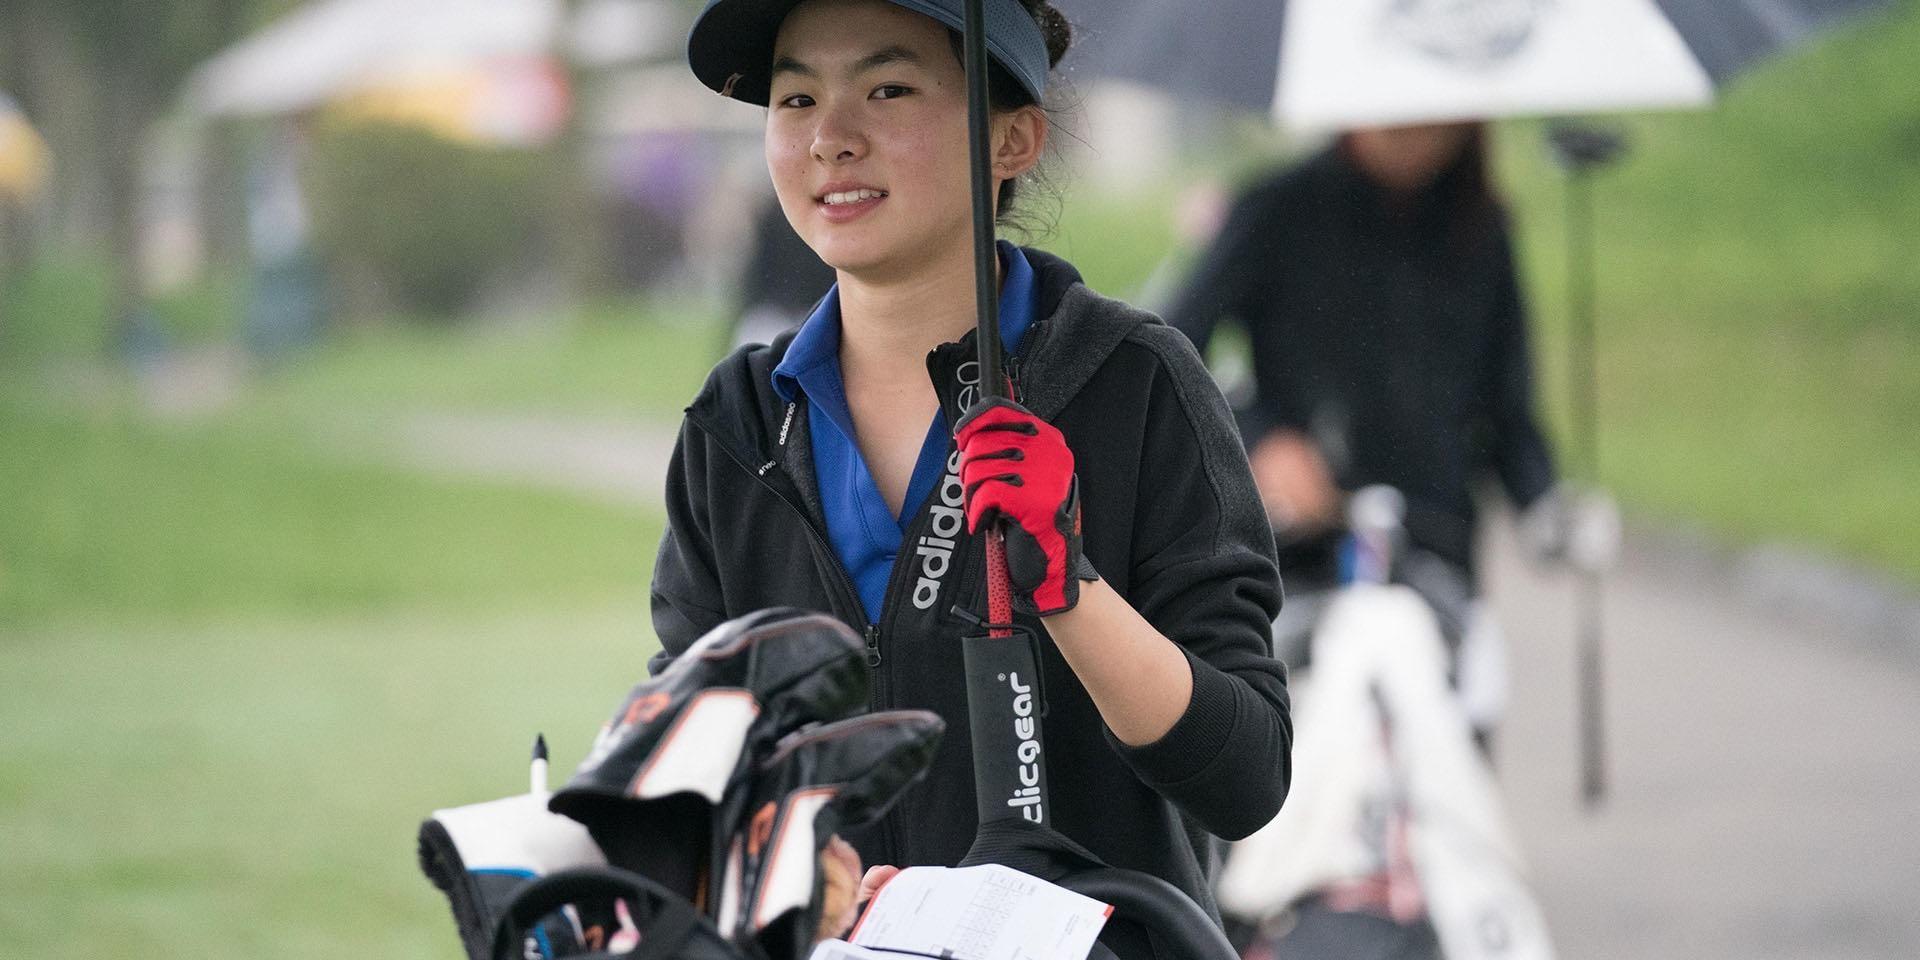 Jiayang Lu at The Southern Junior | Class of 2020 Roadmap